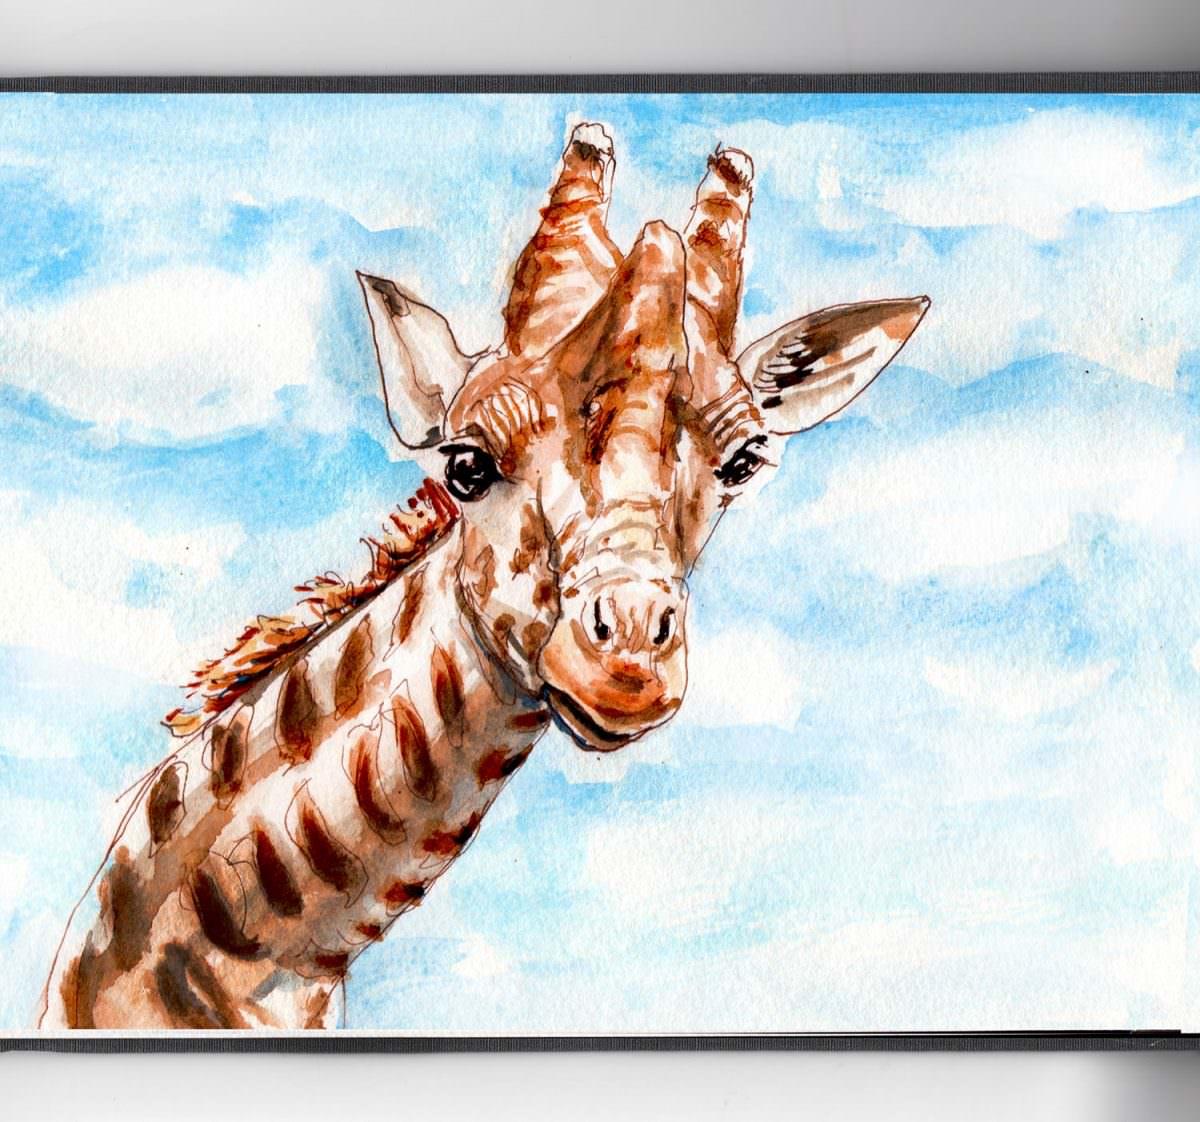 #WorldWatercolorGroup - Day 30 - Watching Clouds Float By Giraffe Watercolor - Doodlewash